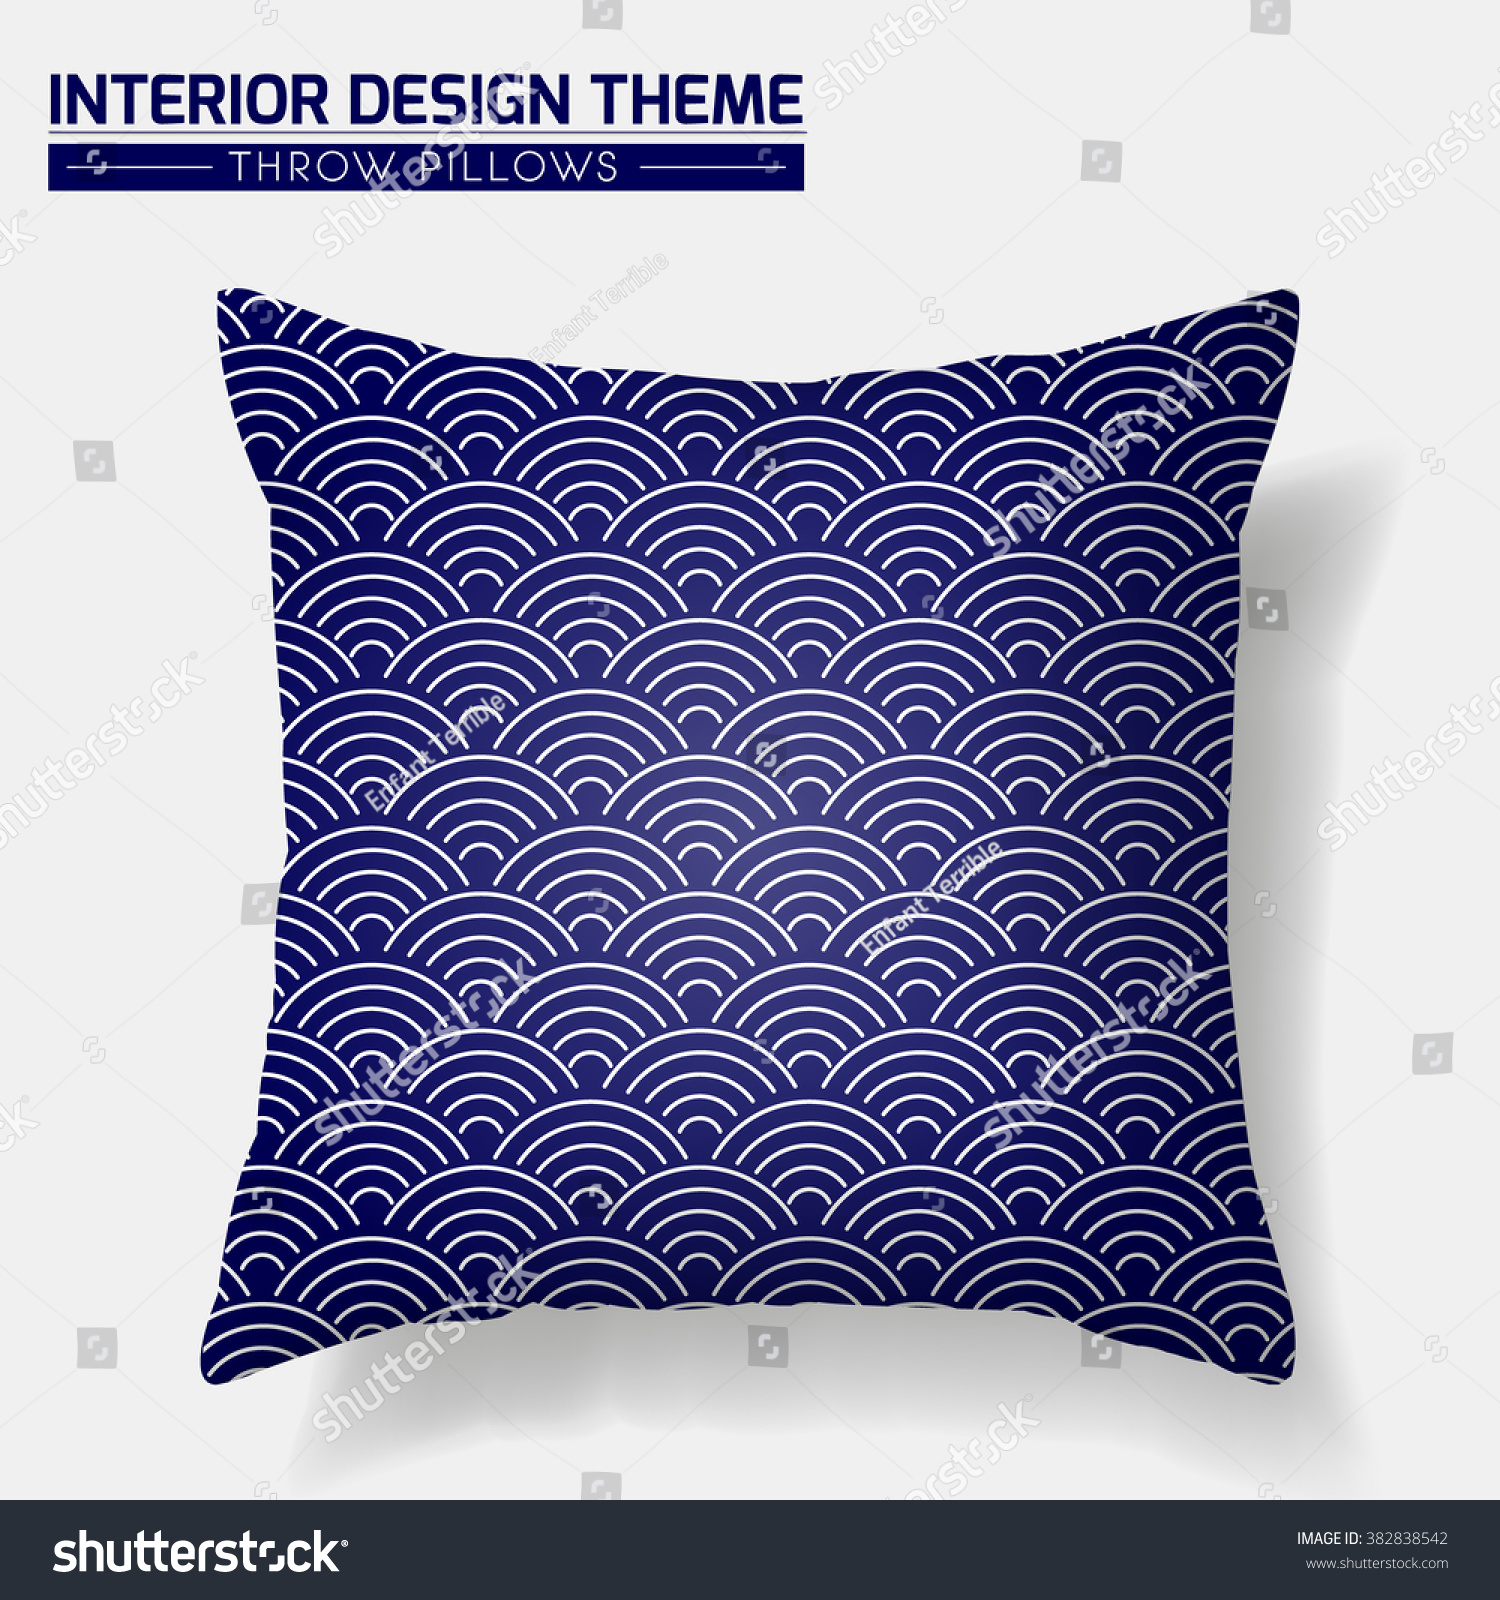 Decorative Throw Pillow Design Template Geometric Stock Vector